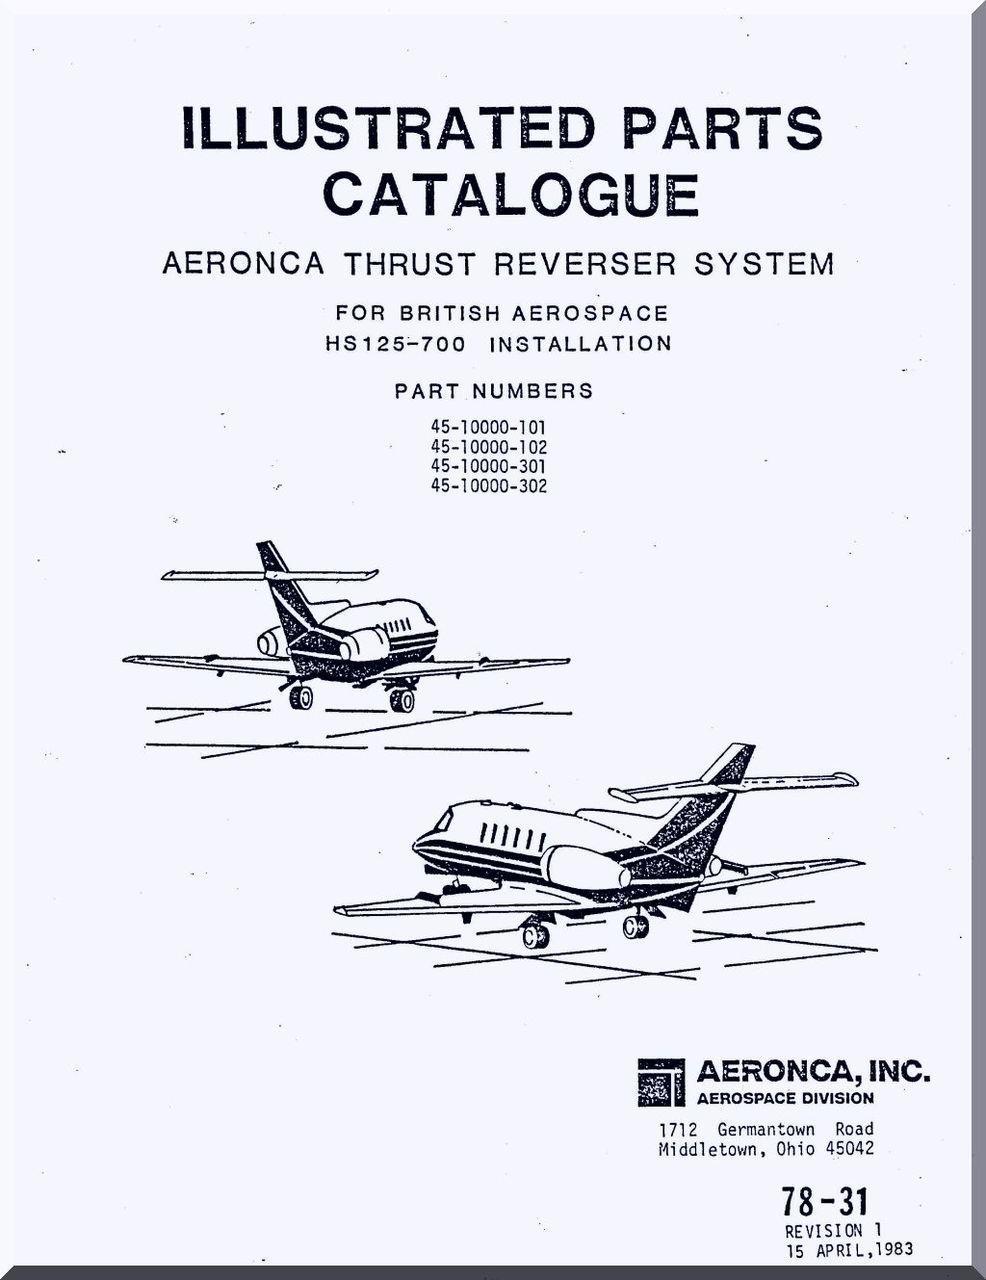 Aeronca Aircraft Engine Thrust Reverser System Illustrated